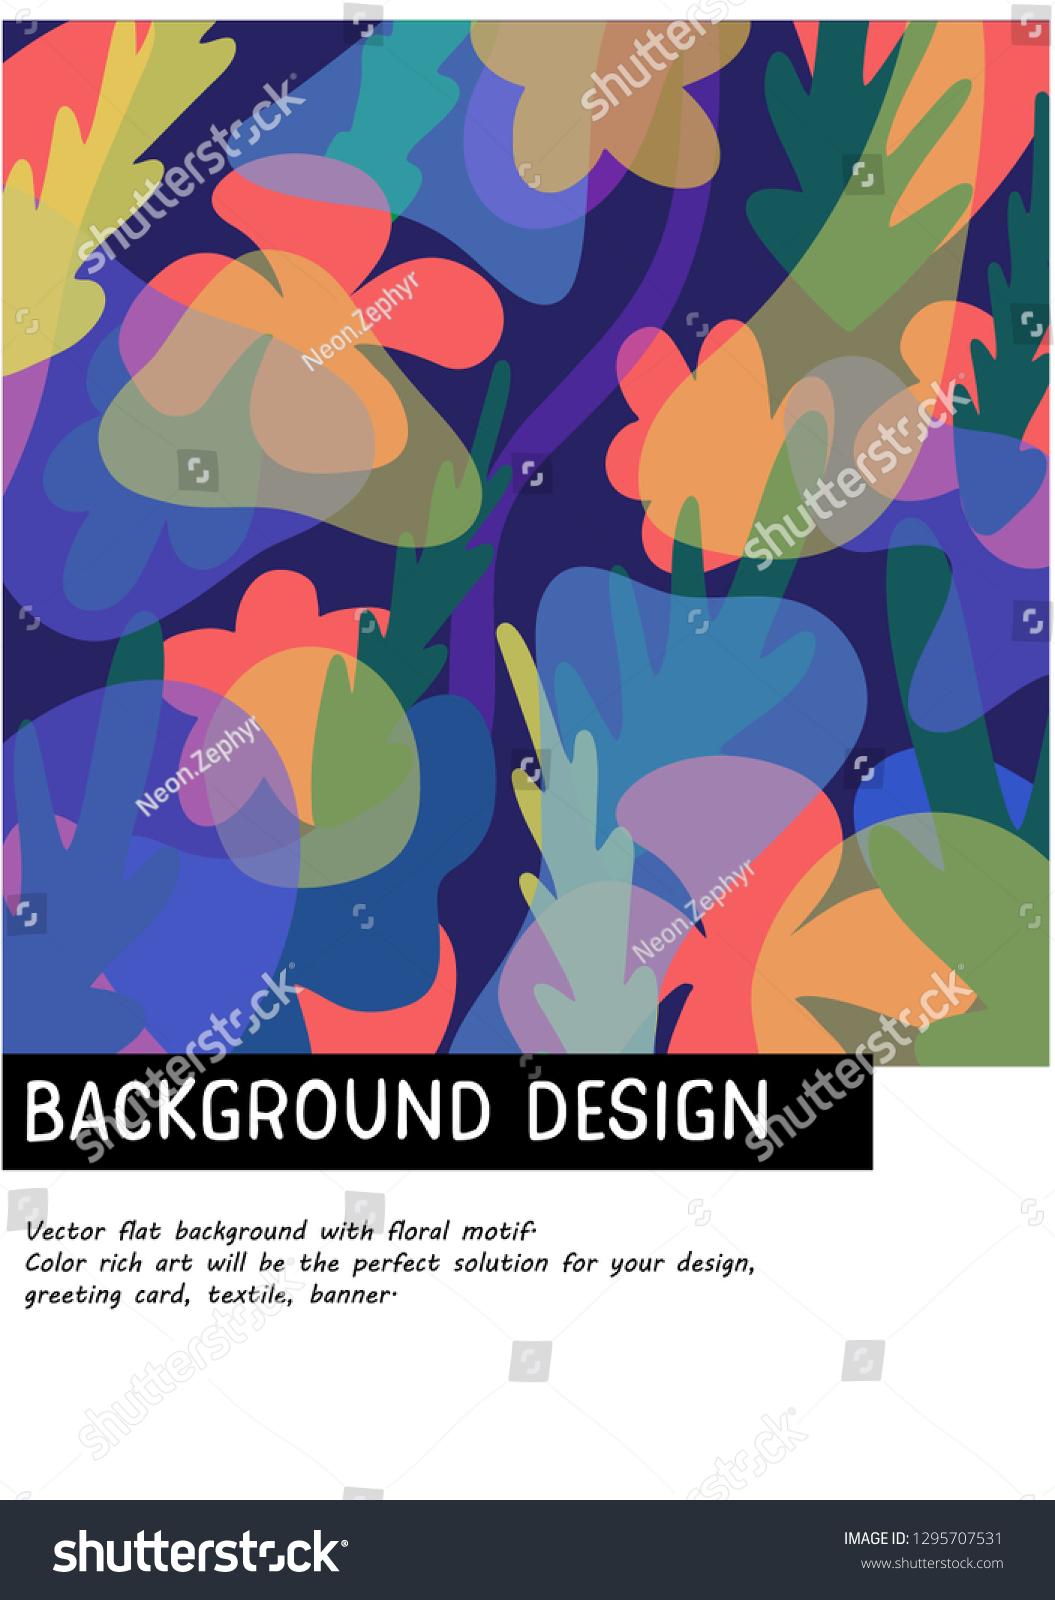 Vector Flat Background Floral Motif Color เวกเตอร์สต็อก (ปลอดค่า